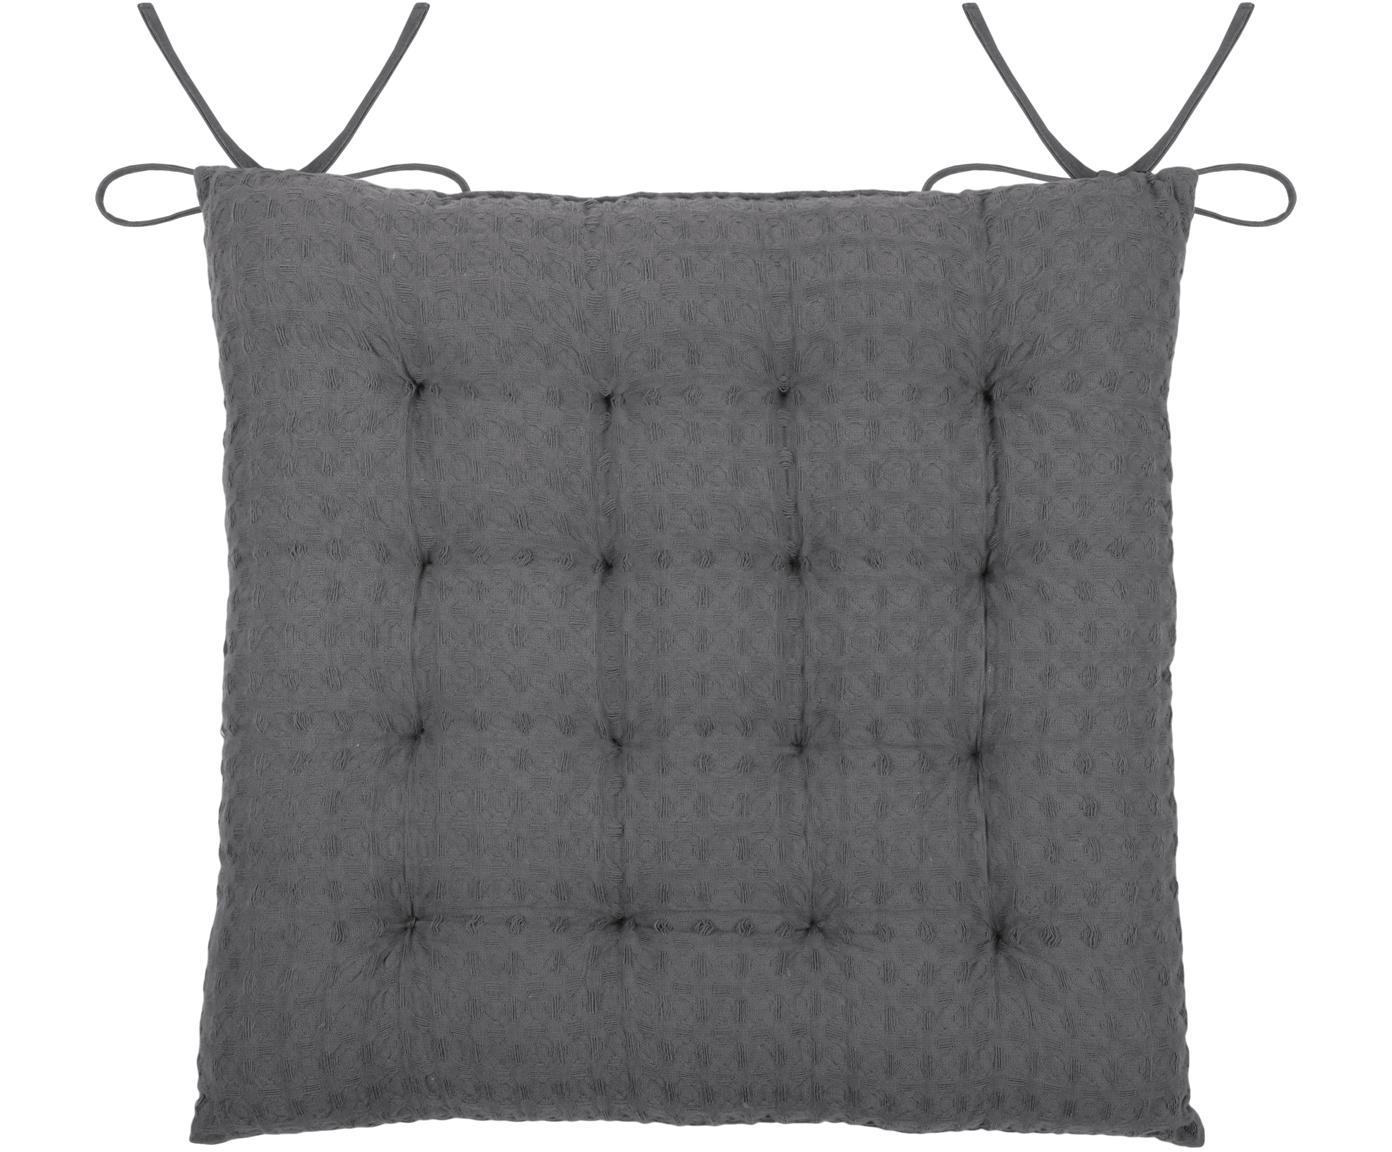 Cuscino sedia a nido d'ape Gopher, Rivestimento: cotone, Grigio scuro, Larg. 40 x Lung. 40 cm